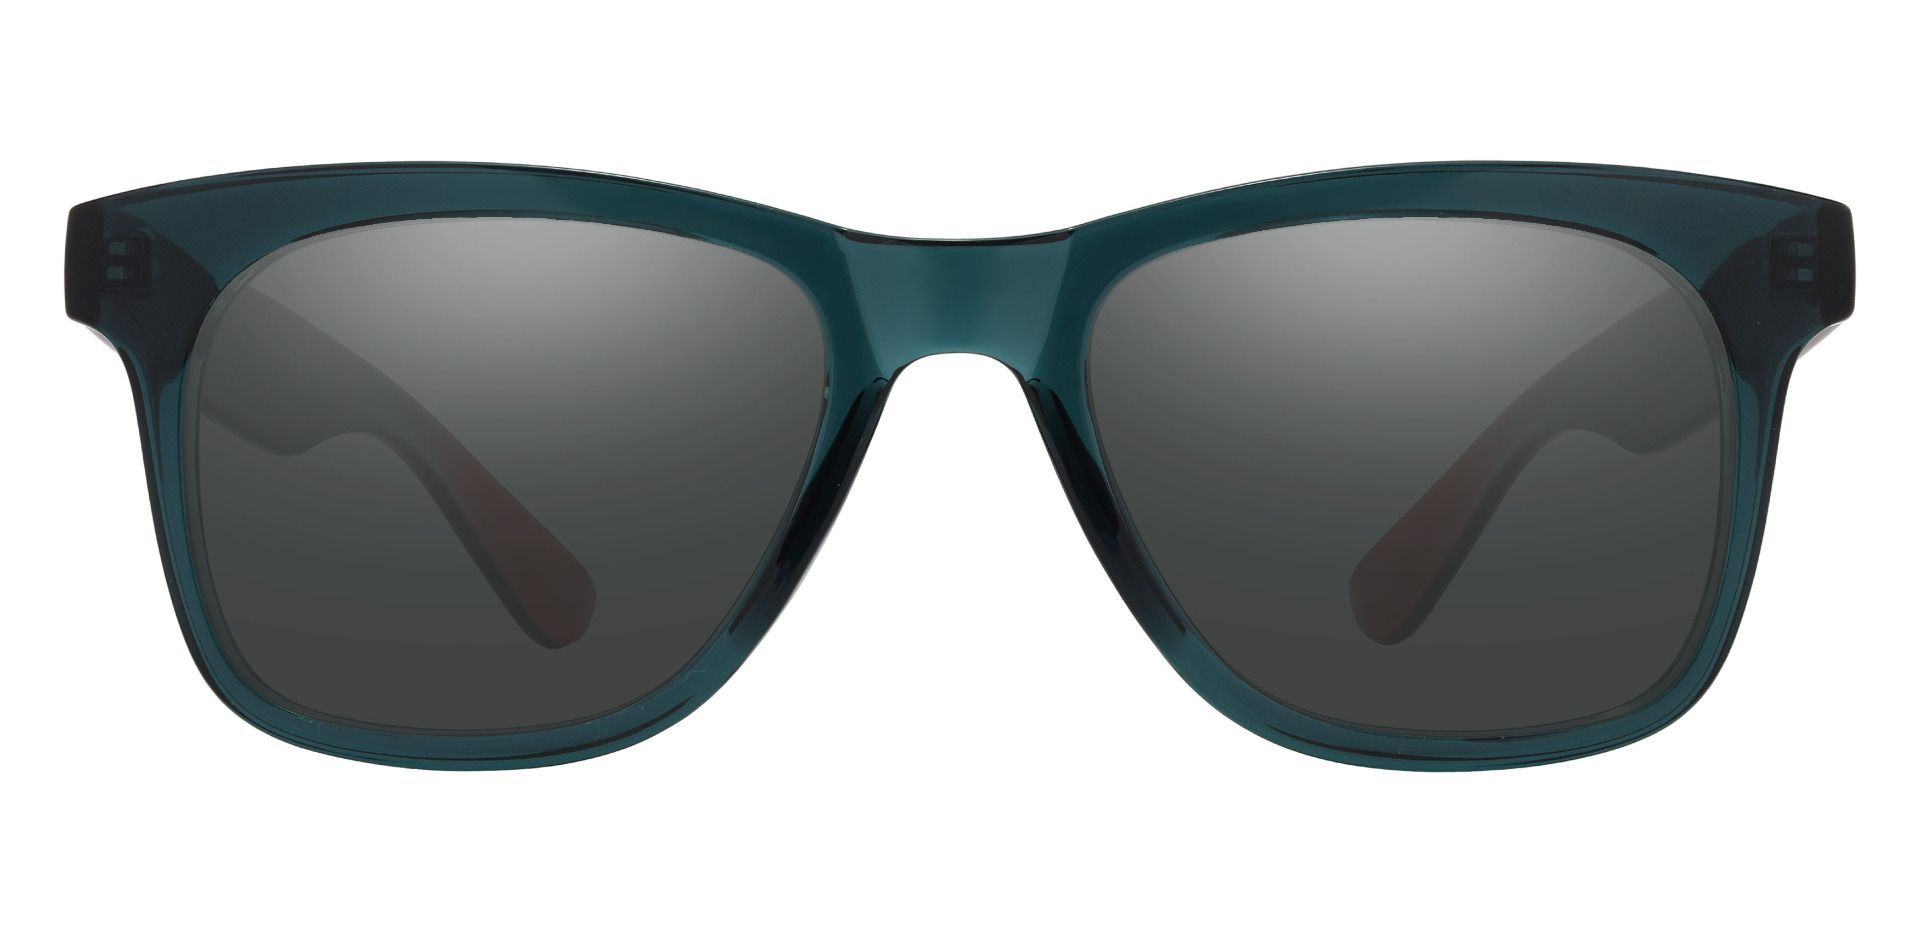 Hurley Square Prescription Sunglasses - Green Frame With Gray Lenses